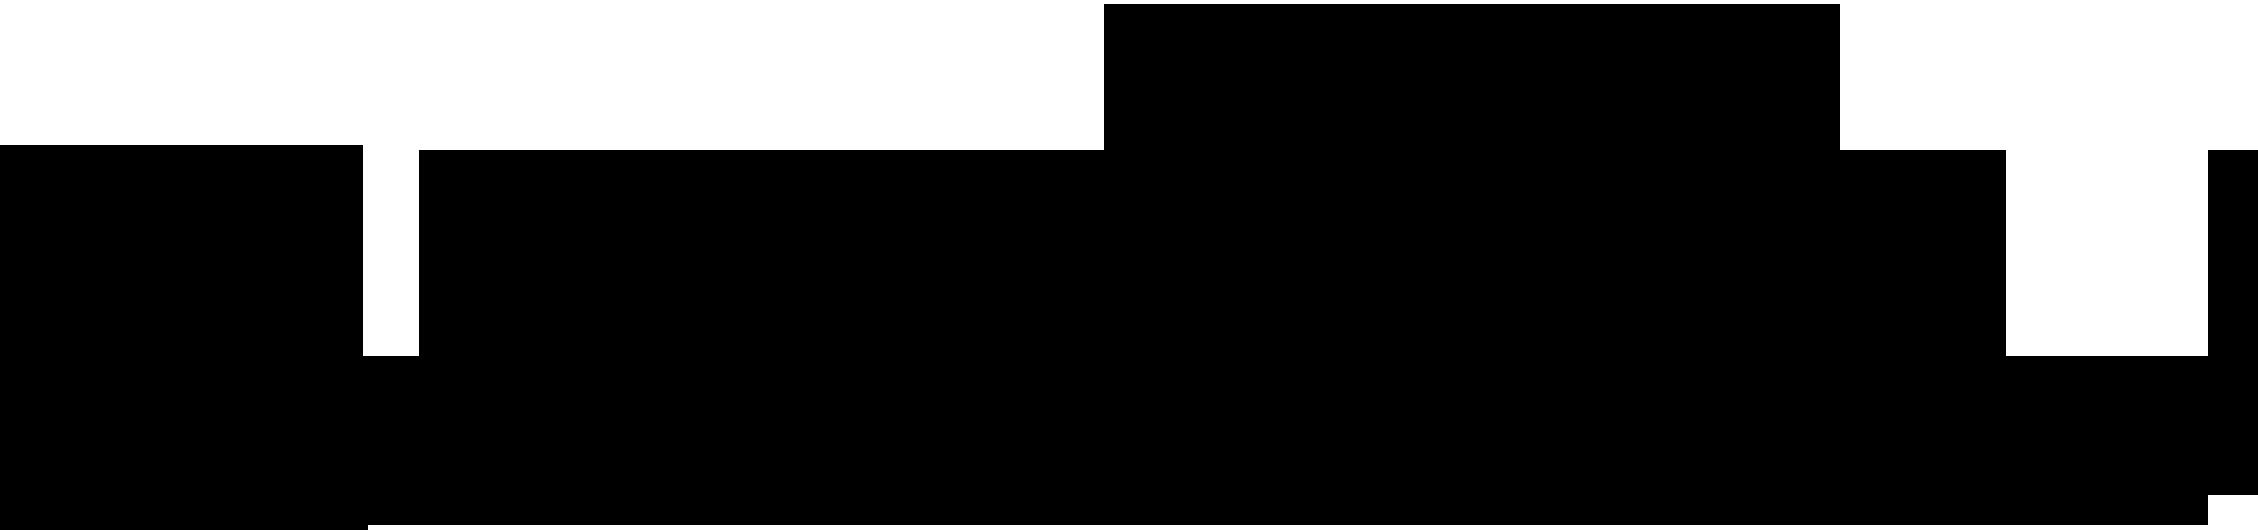 glaceau-logo.png